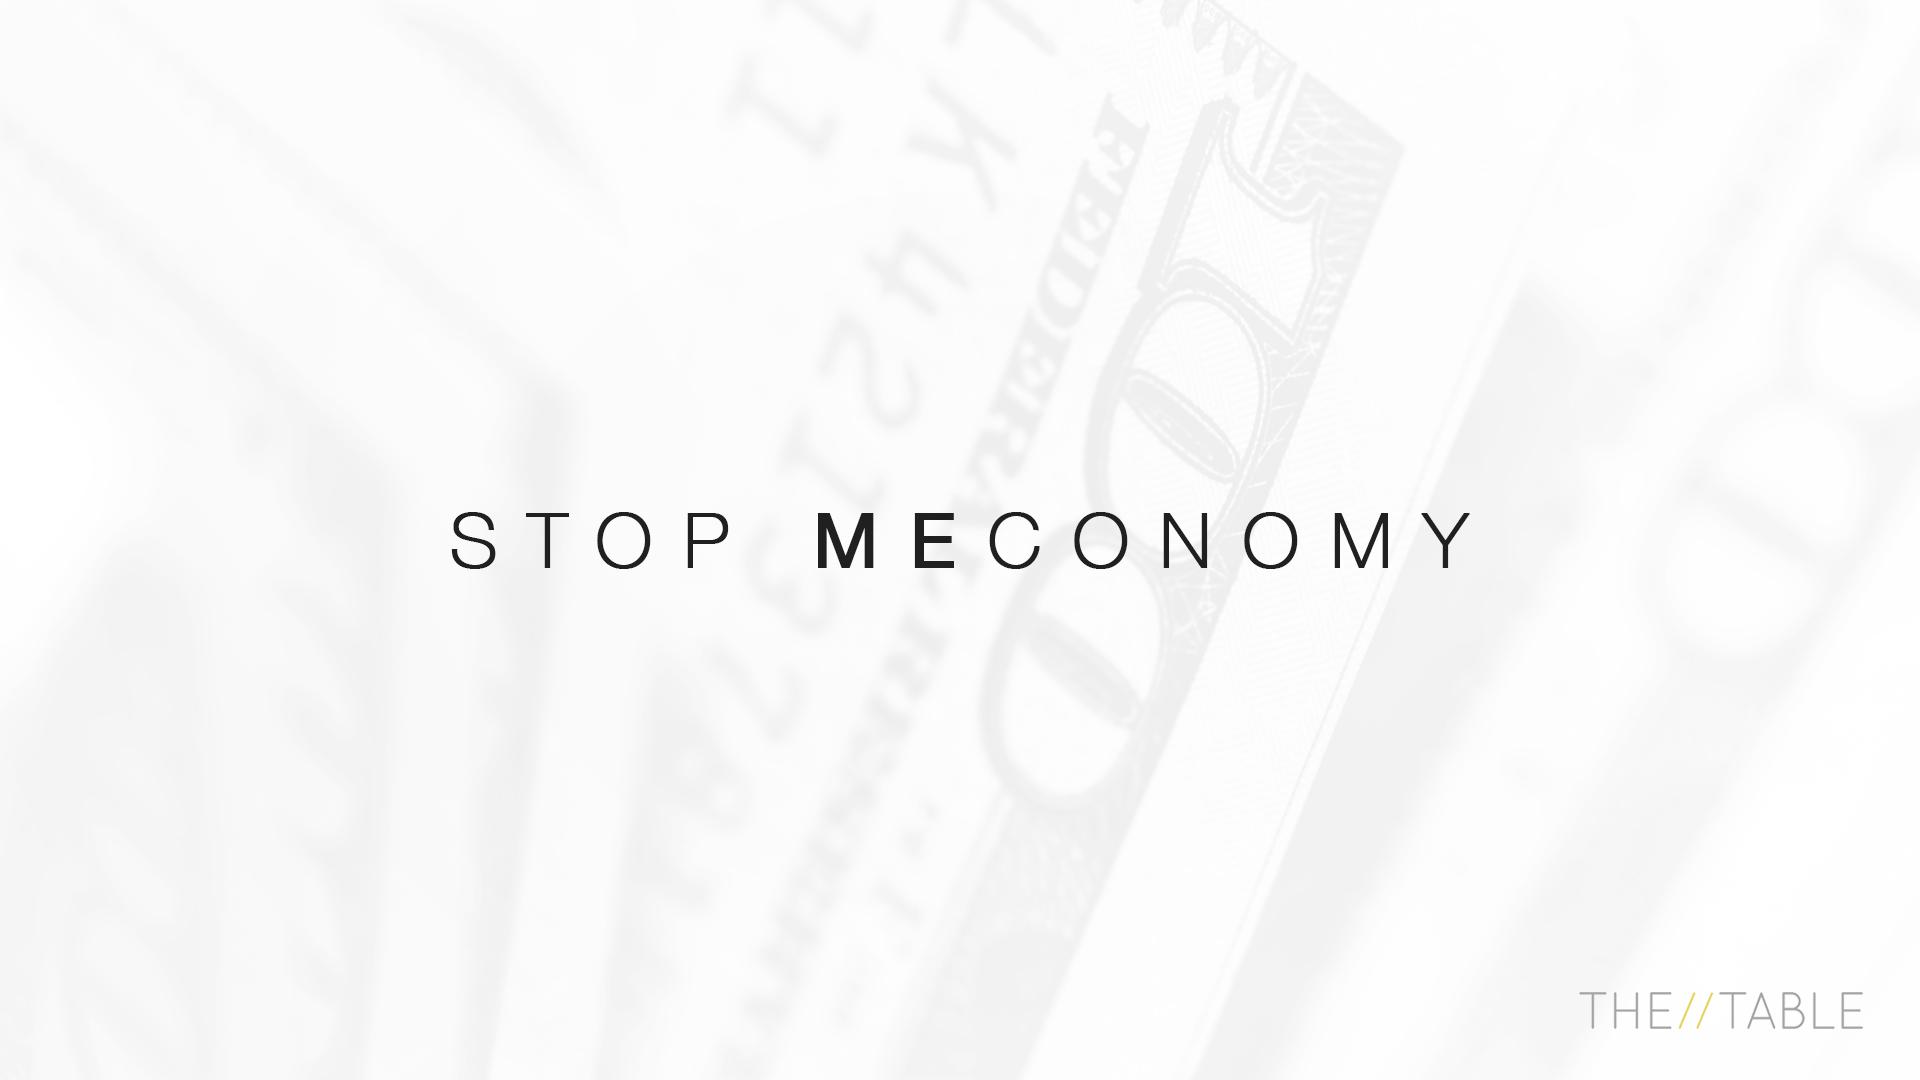 MEconomy.jpg